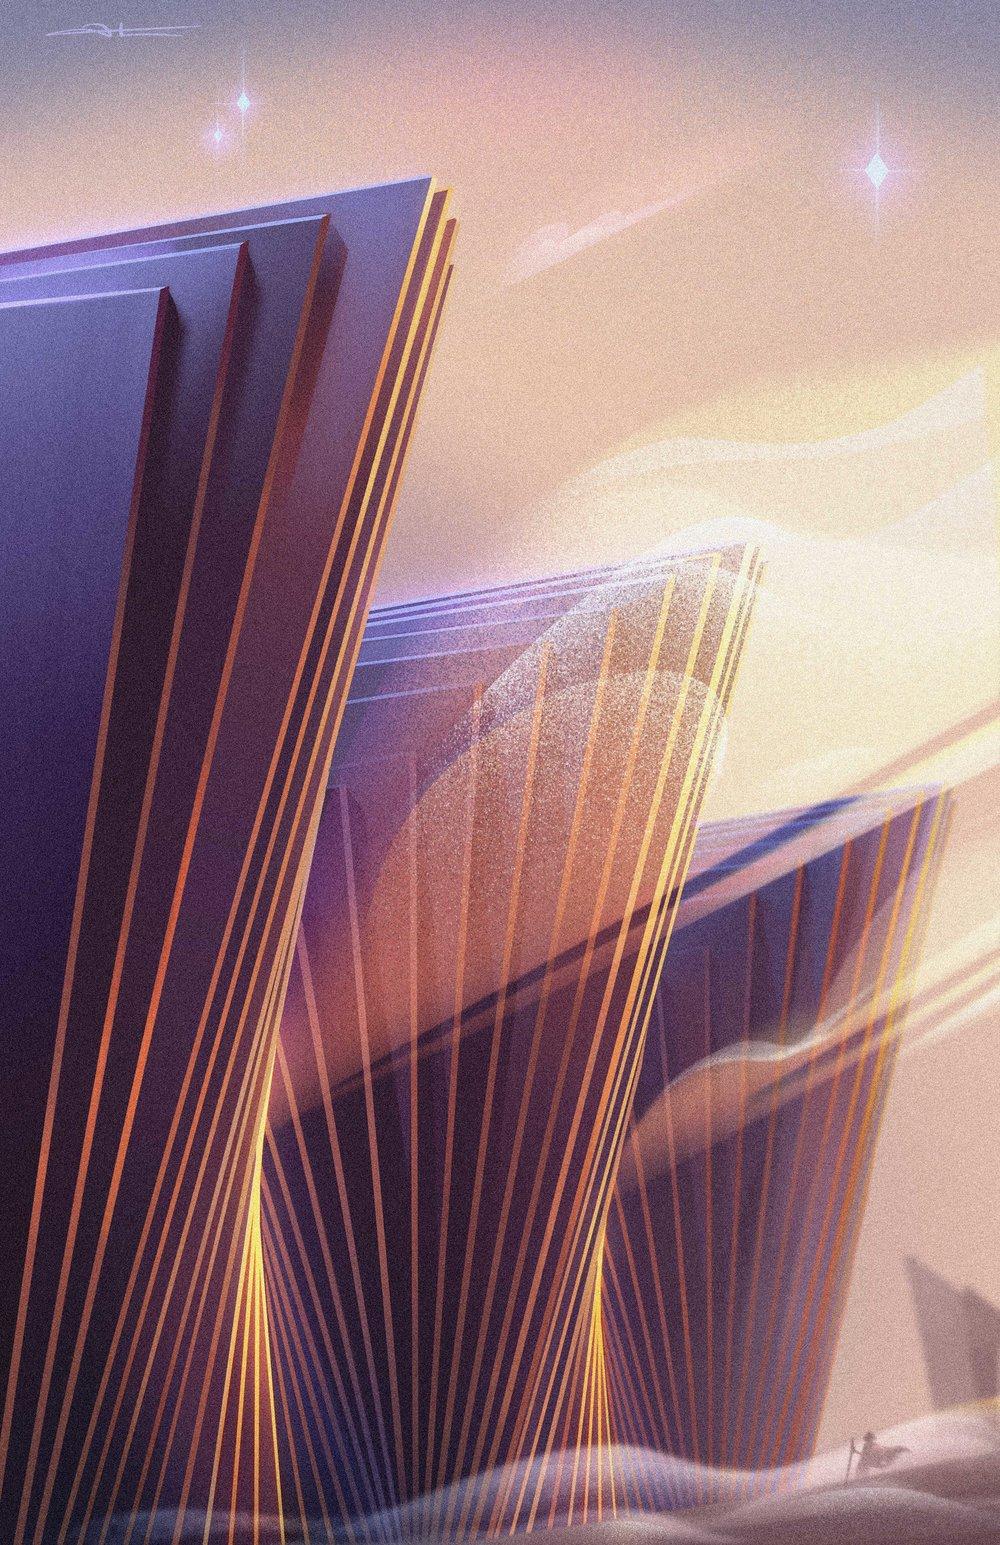 Abstract_final.jpg